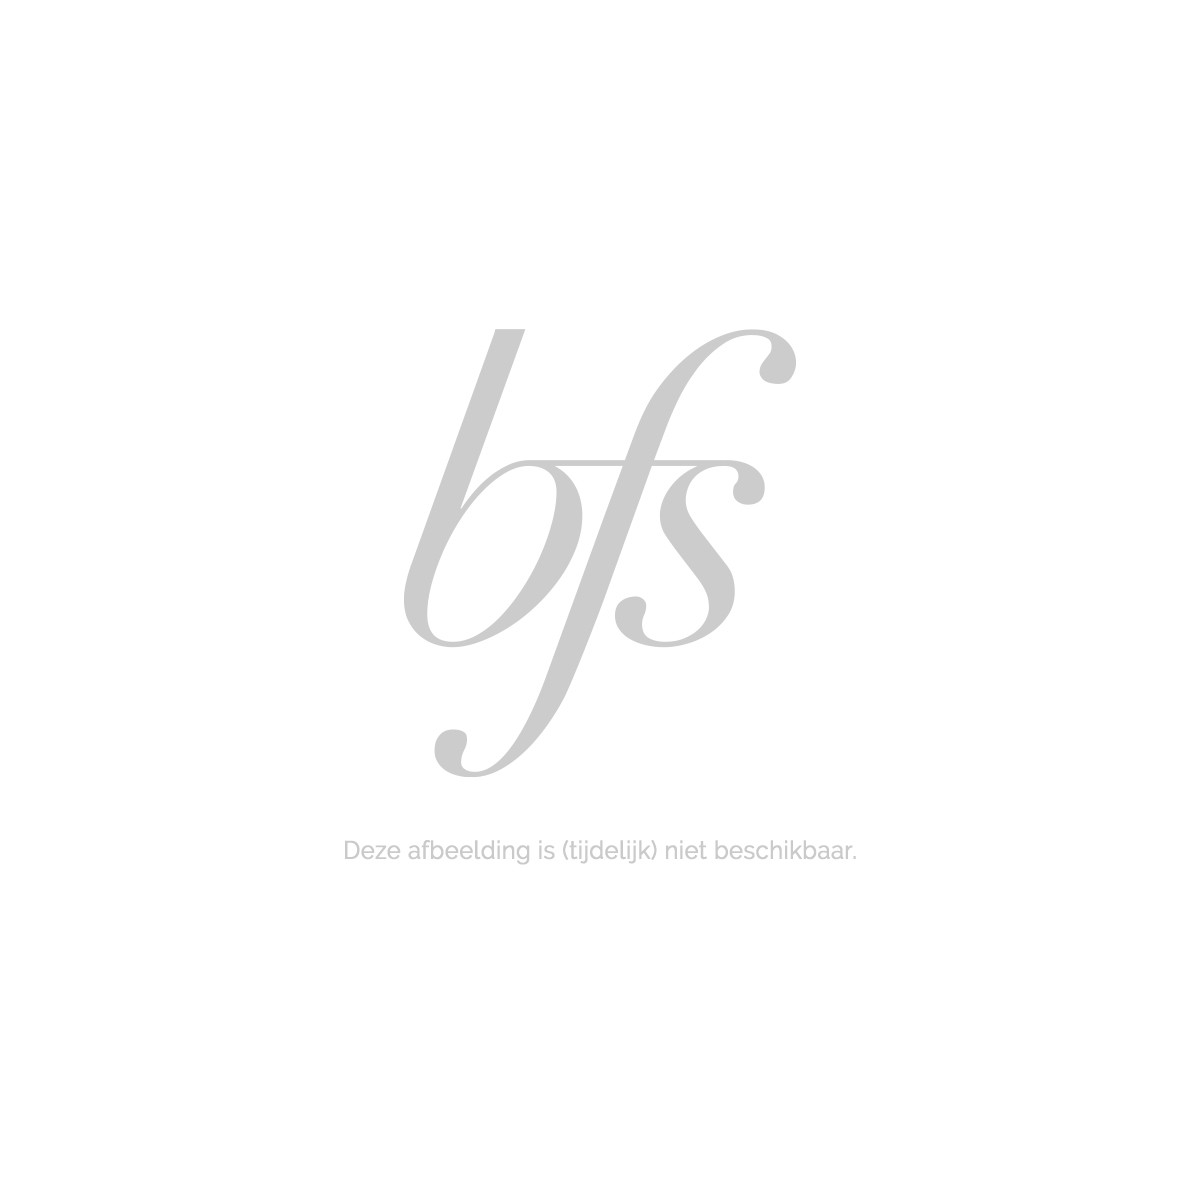 Pupa IM Matt Lipstick 013 Brown Rose